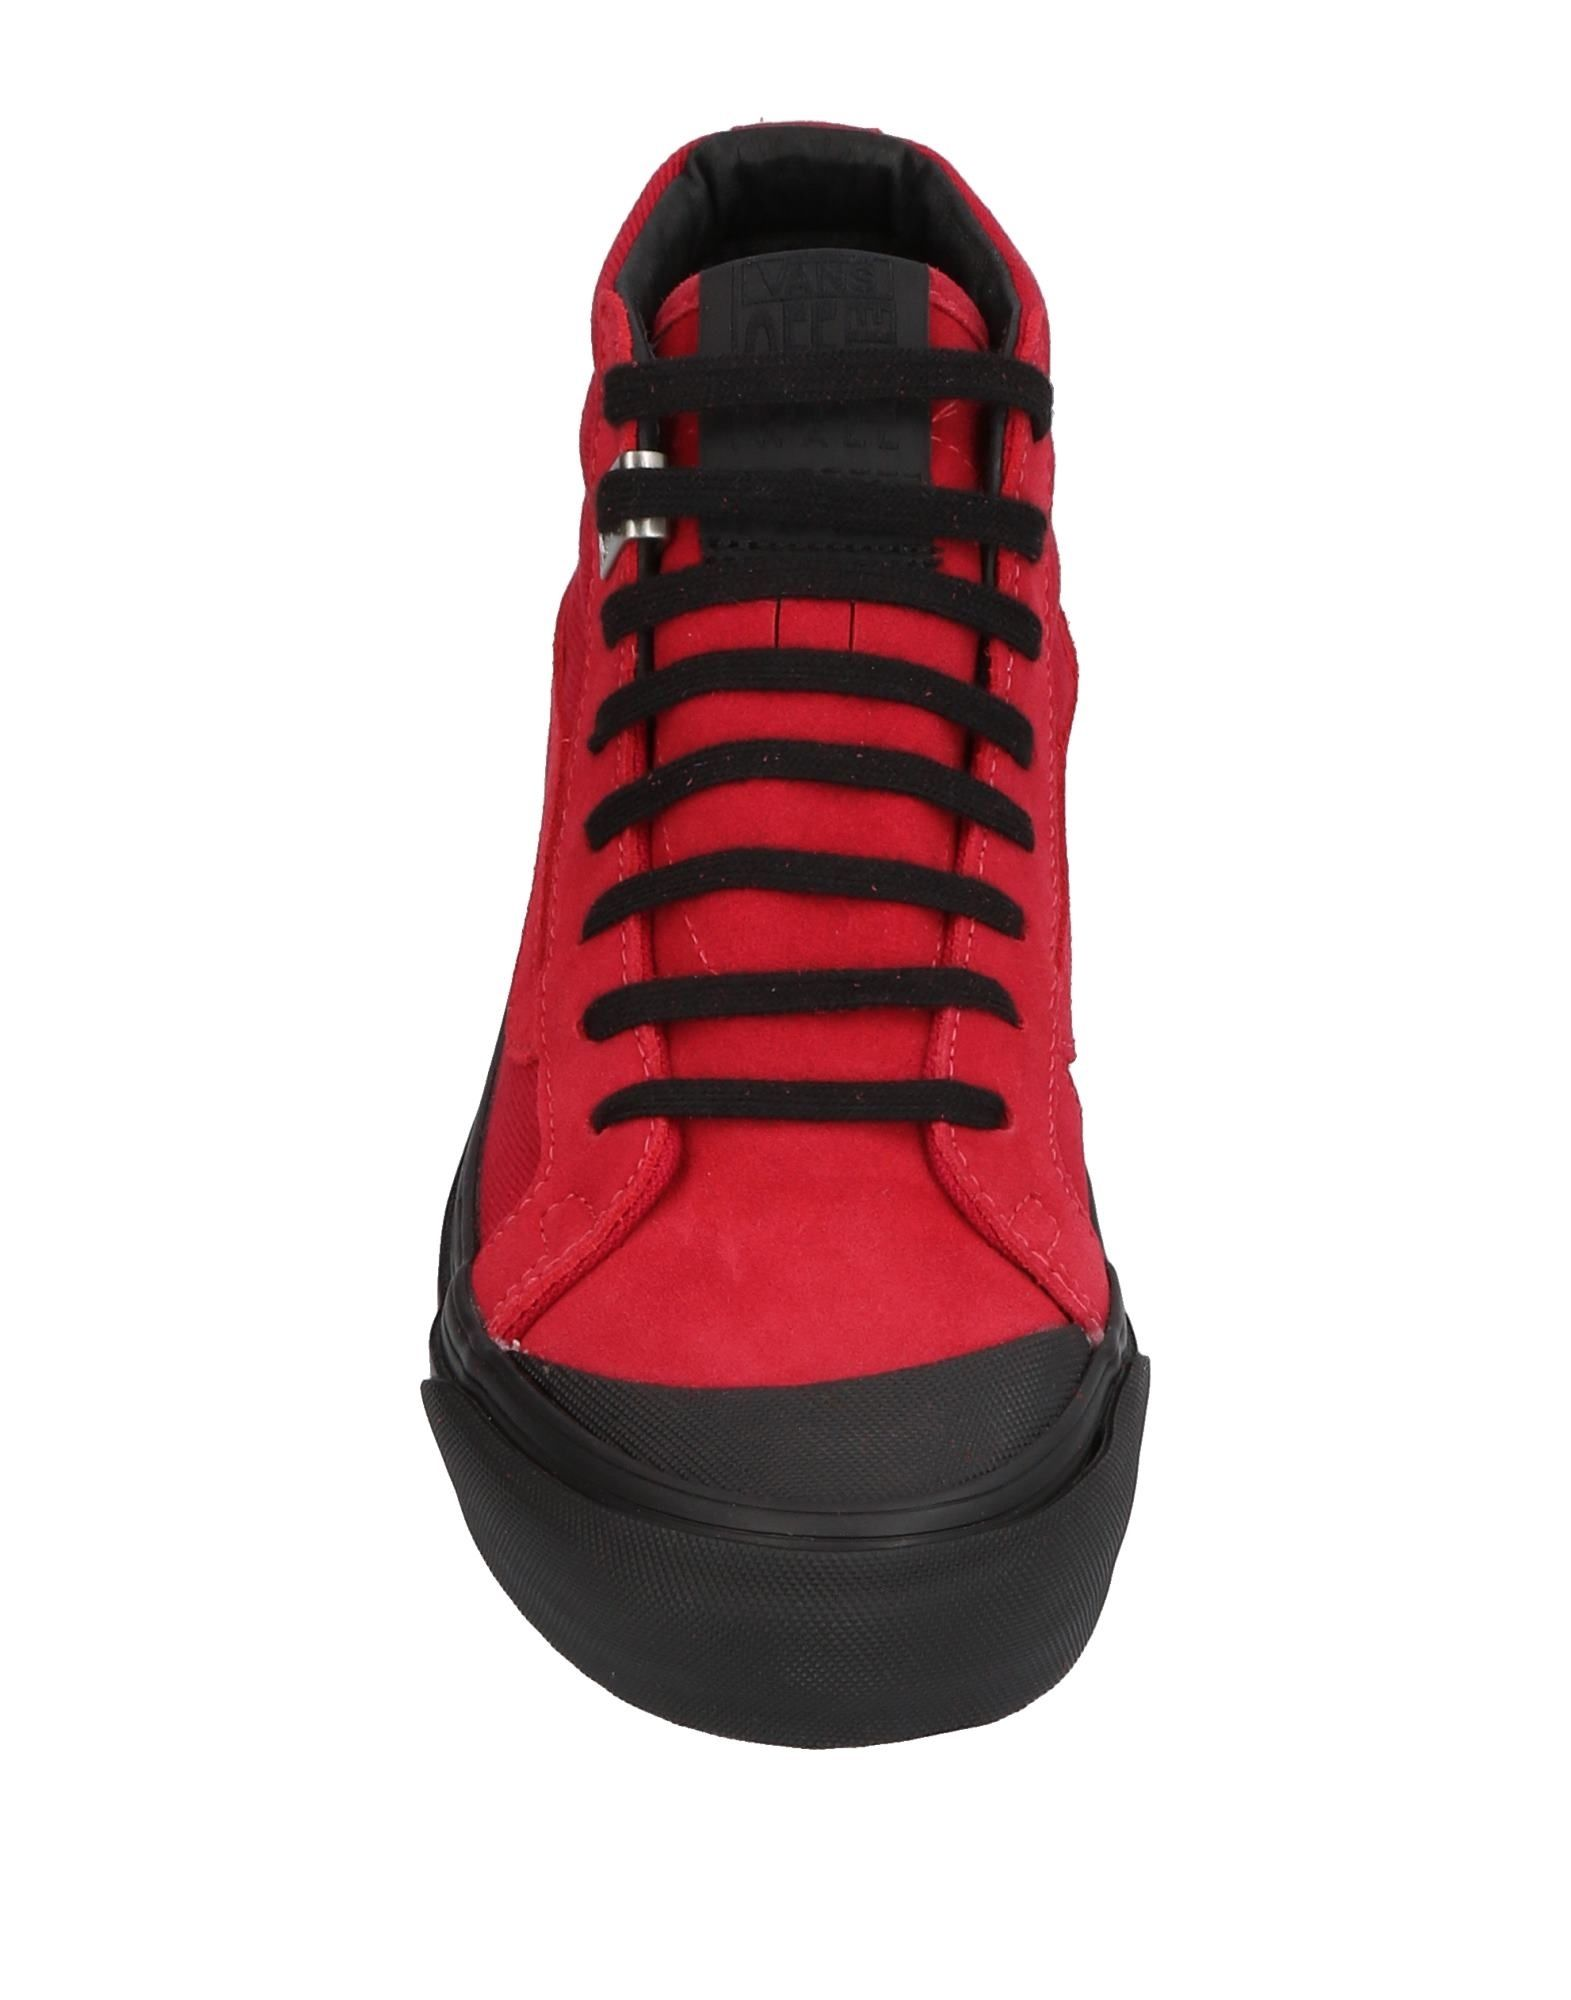 Vans Sneakers Damen  beliebte 11442449GP Gute Qualität beliebte  Schuhe 28f6cc